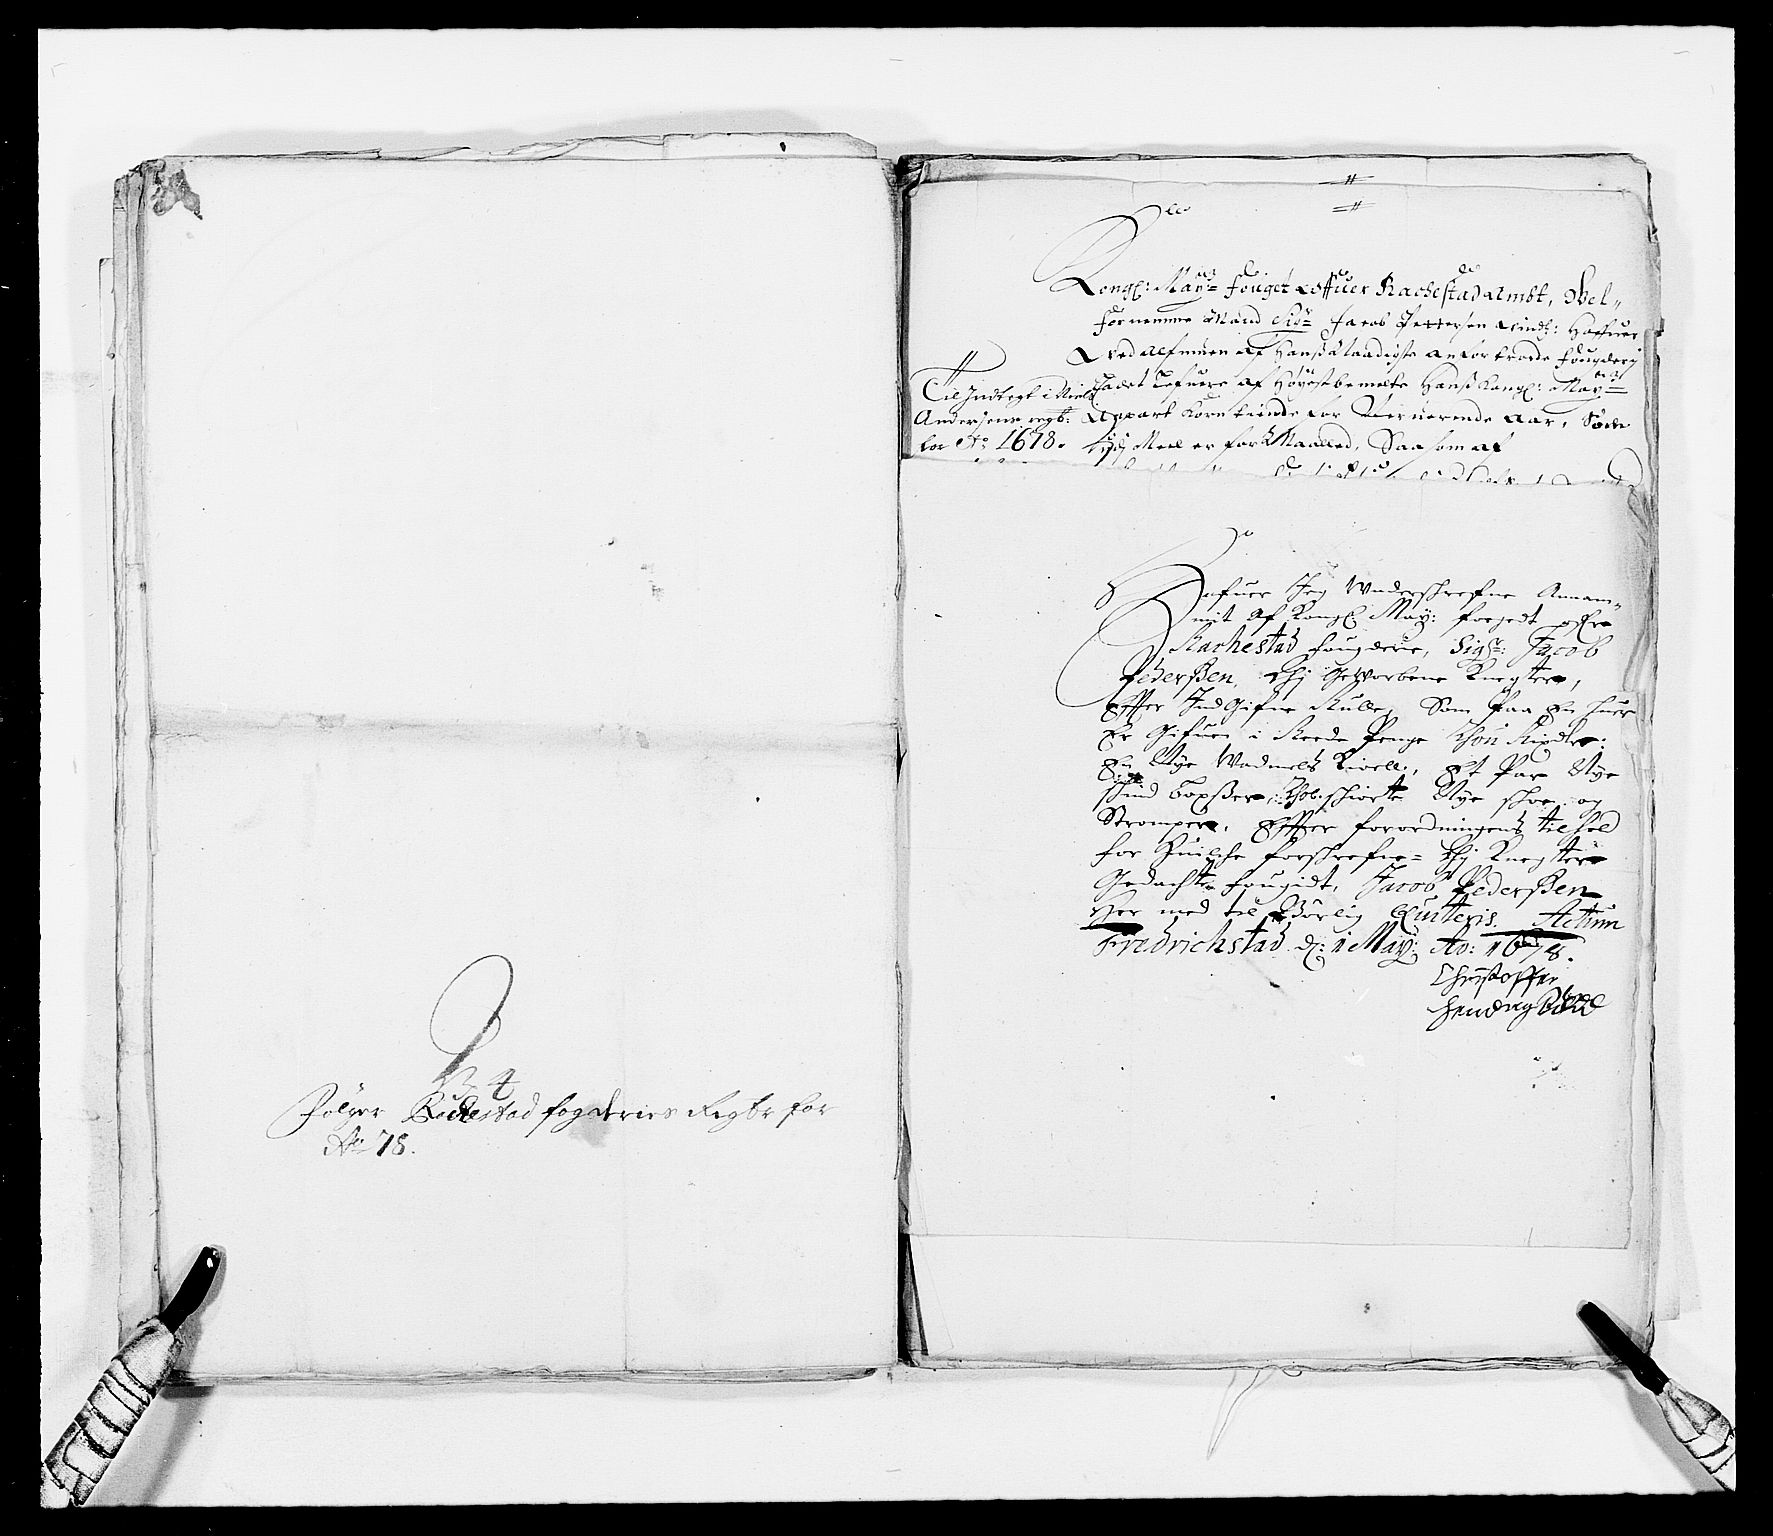 RA, Rentekammeret inntil 1814, Reviderte regnskaper, Fogderegnskap, R05/L0271: Fogderegnskap Rakkestad, 1678-1679, s. 510